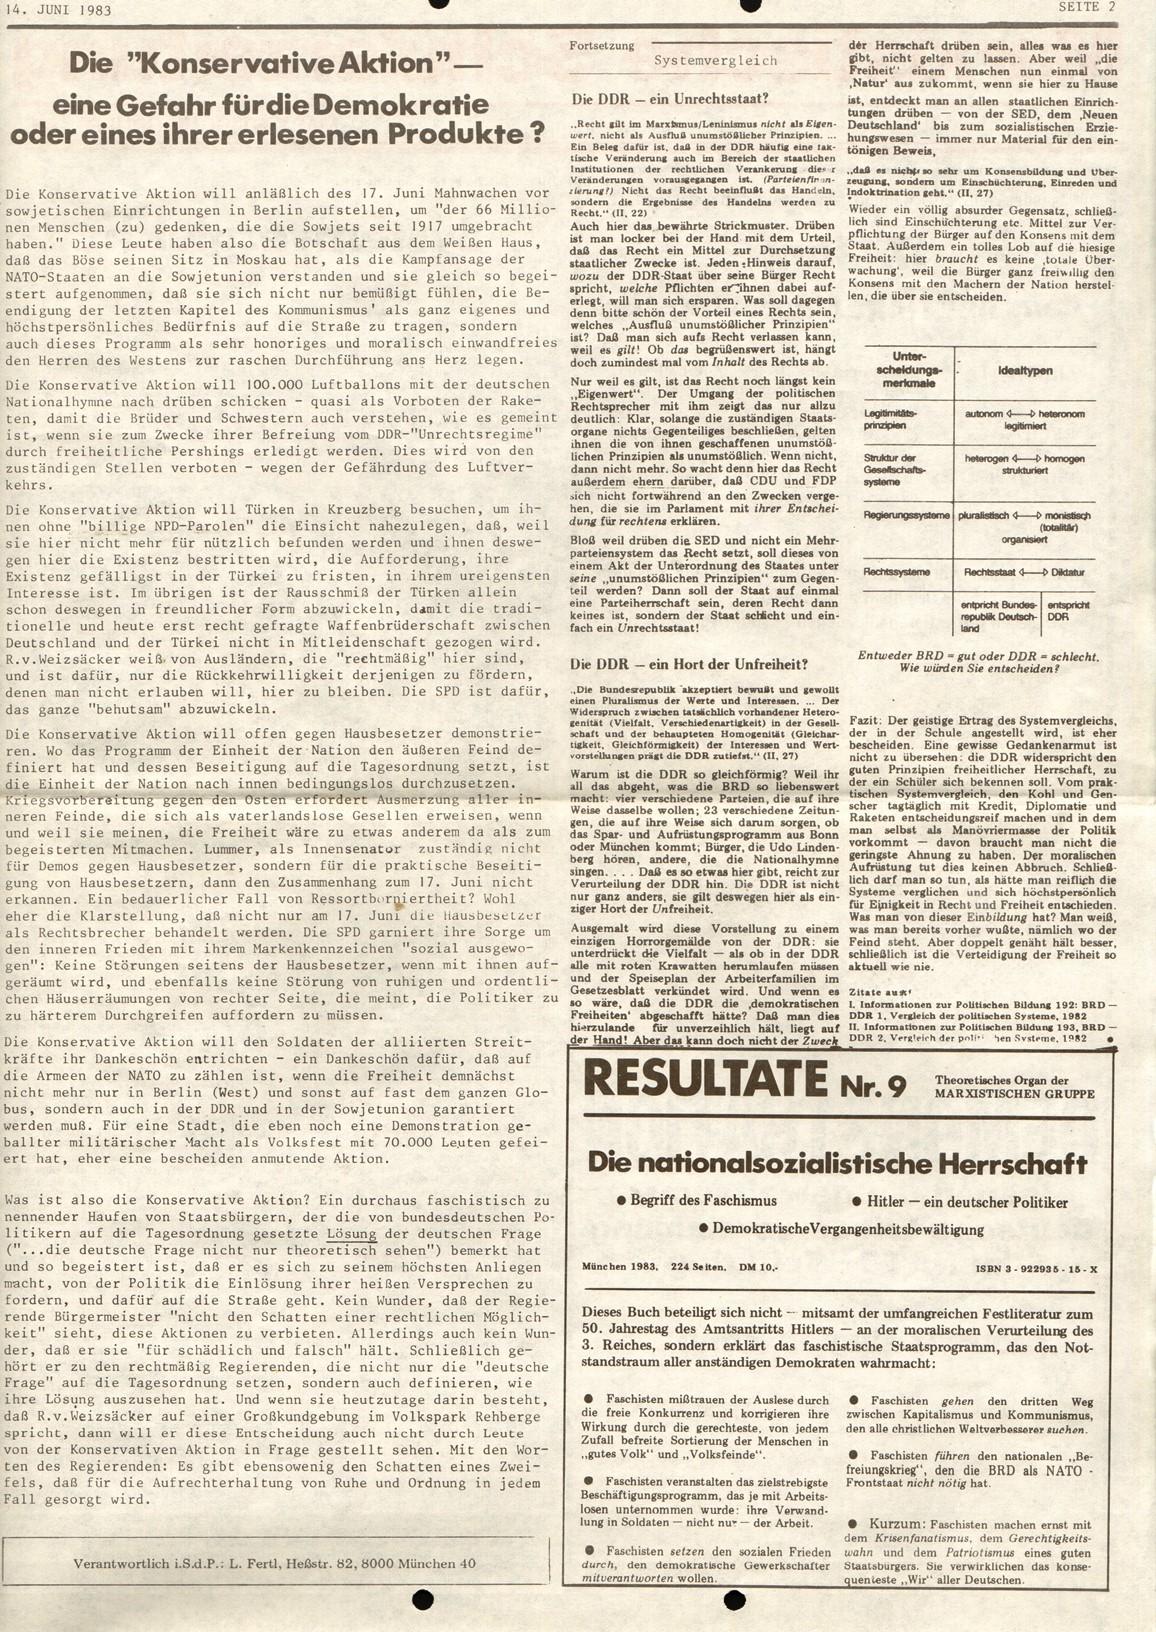 Berlin_MG_Marxistische_Schuelerzeitung_19830614_02